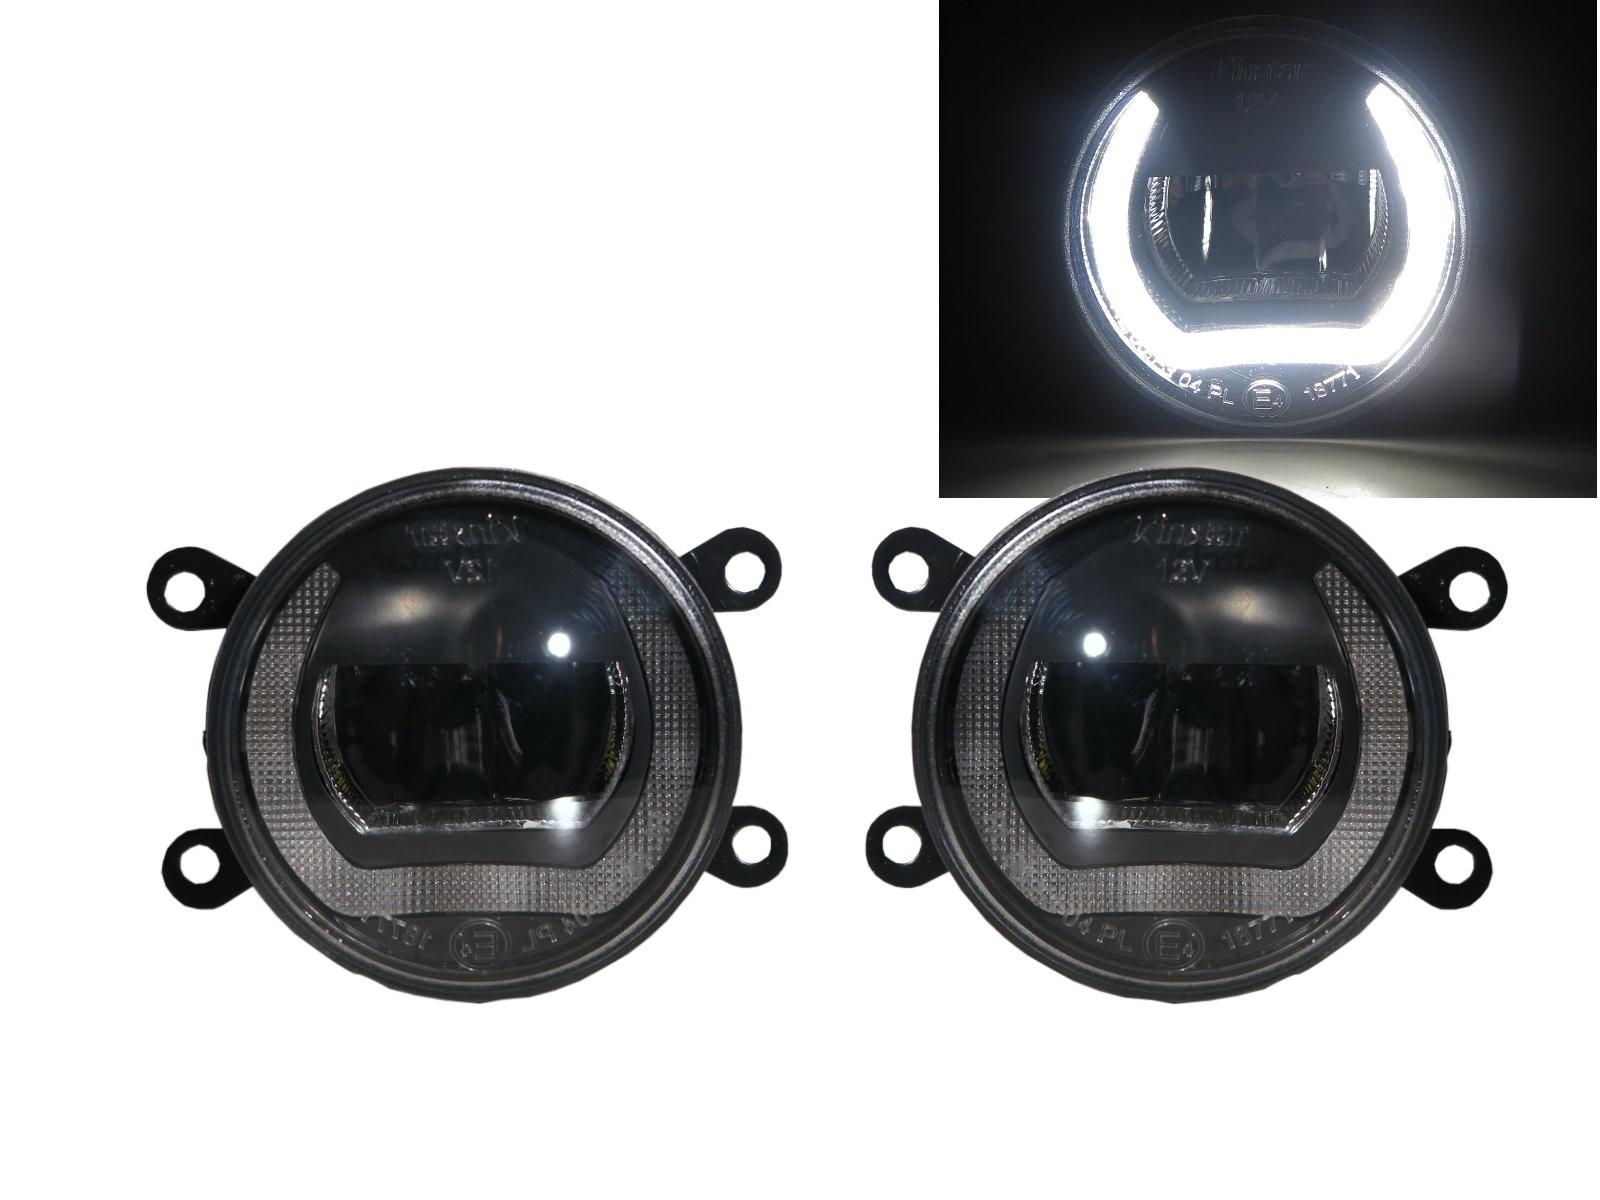 CrazyTheGod ZAFIRA-B Second generation 2005-2011 MPV 5D DRL Ubar LED Glass Fog Light Lamp Black for VAUXHALL